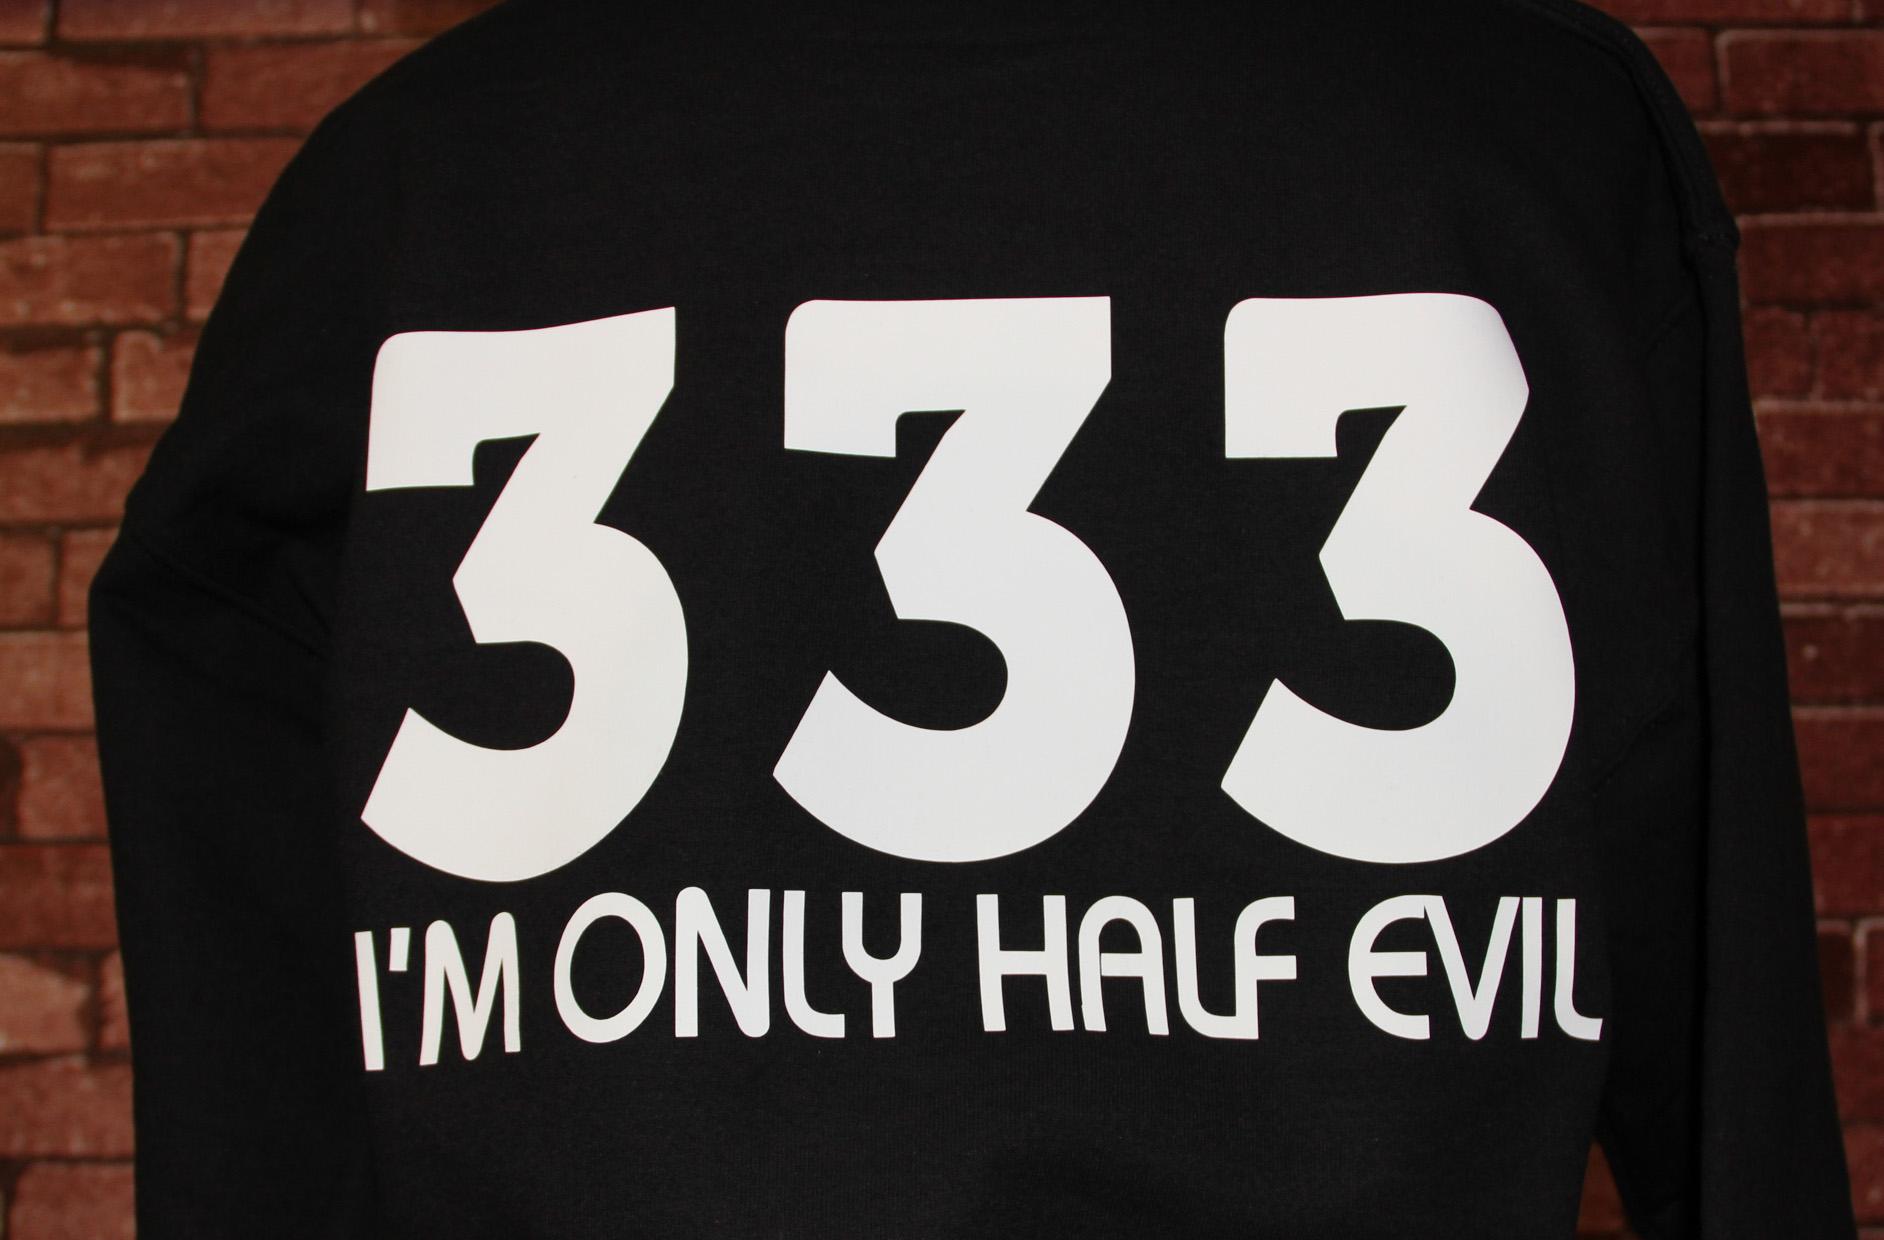 3-3-3-im-only-half-evil-biker-t-shirts.jpg